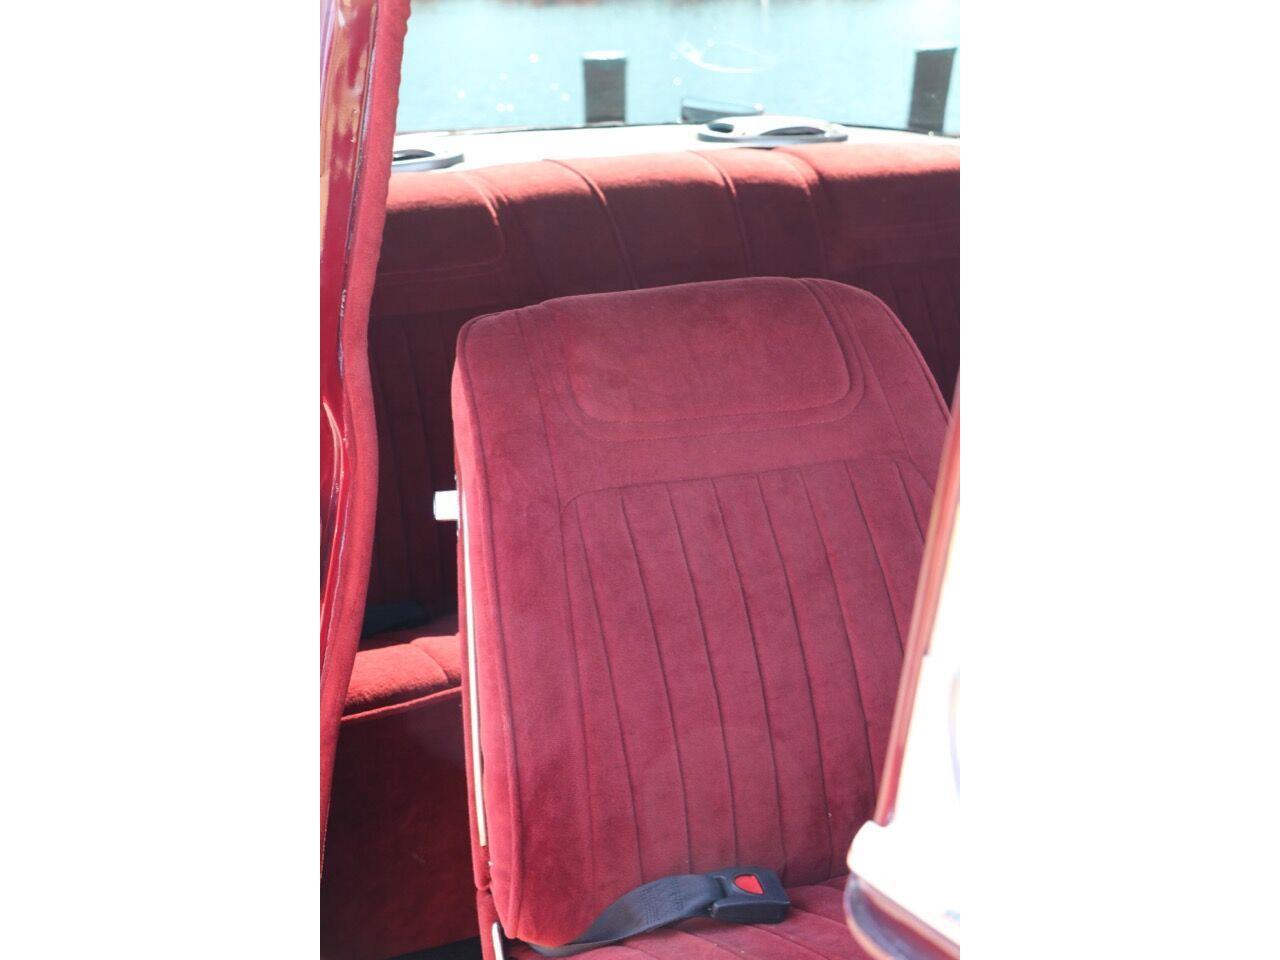 1957 Chevrolet Bel Air (CC-1421445) for sale in Clarksburg, Maryland